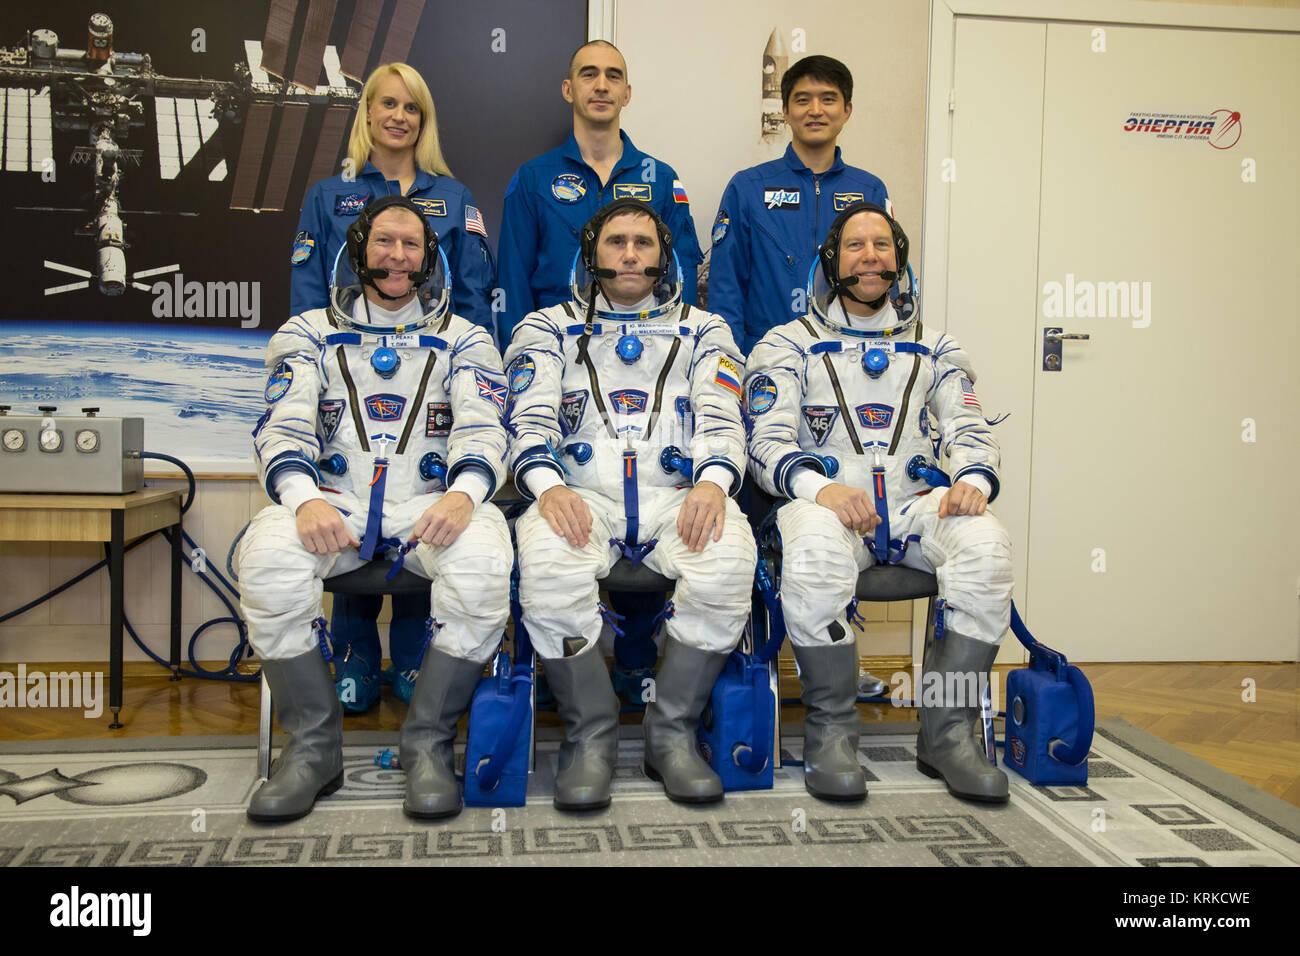 Soyuz TMA-19M crew with backup crew at the Baikonur Cosmodrome - Stock Image